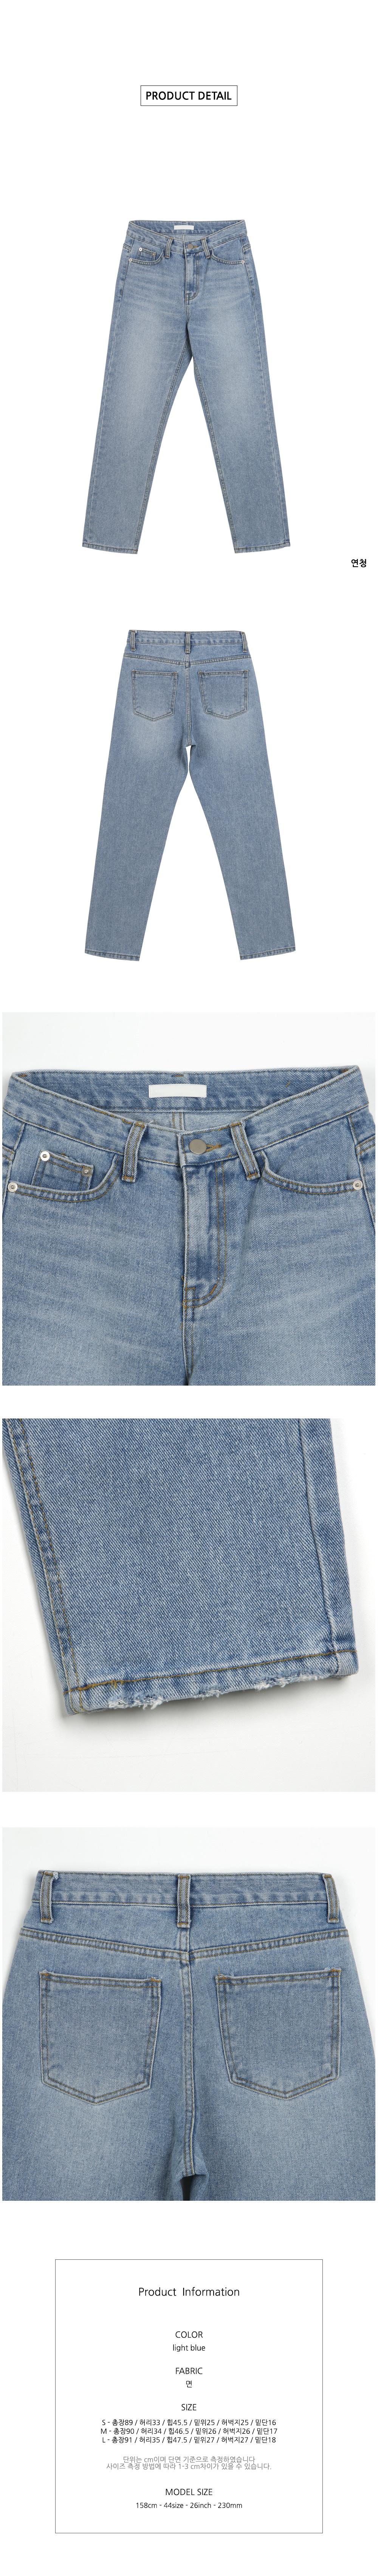 Loose-fit cover Light Blue Denim P # YW394